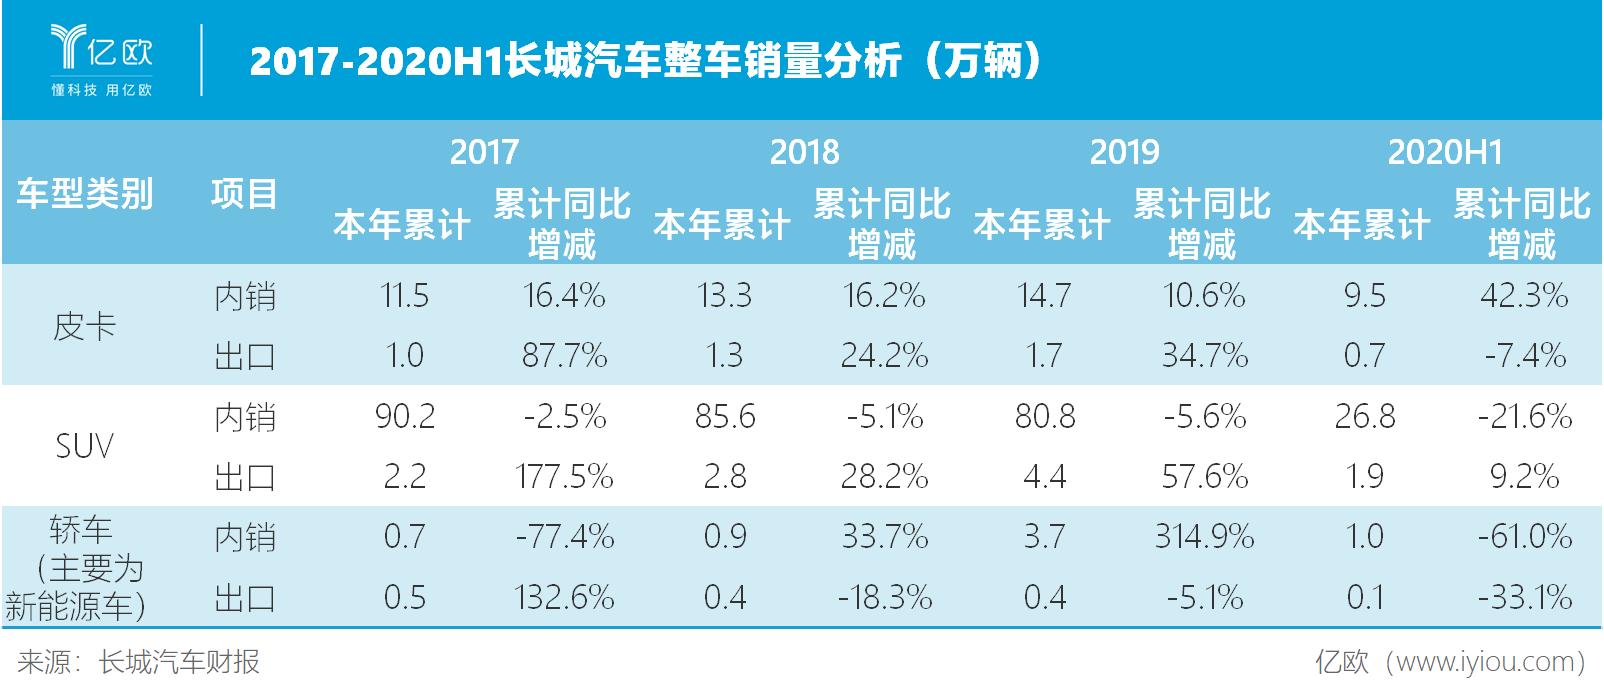 2017-2020H1长城汽车整车销量分析(万辆)